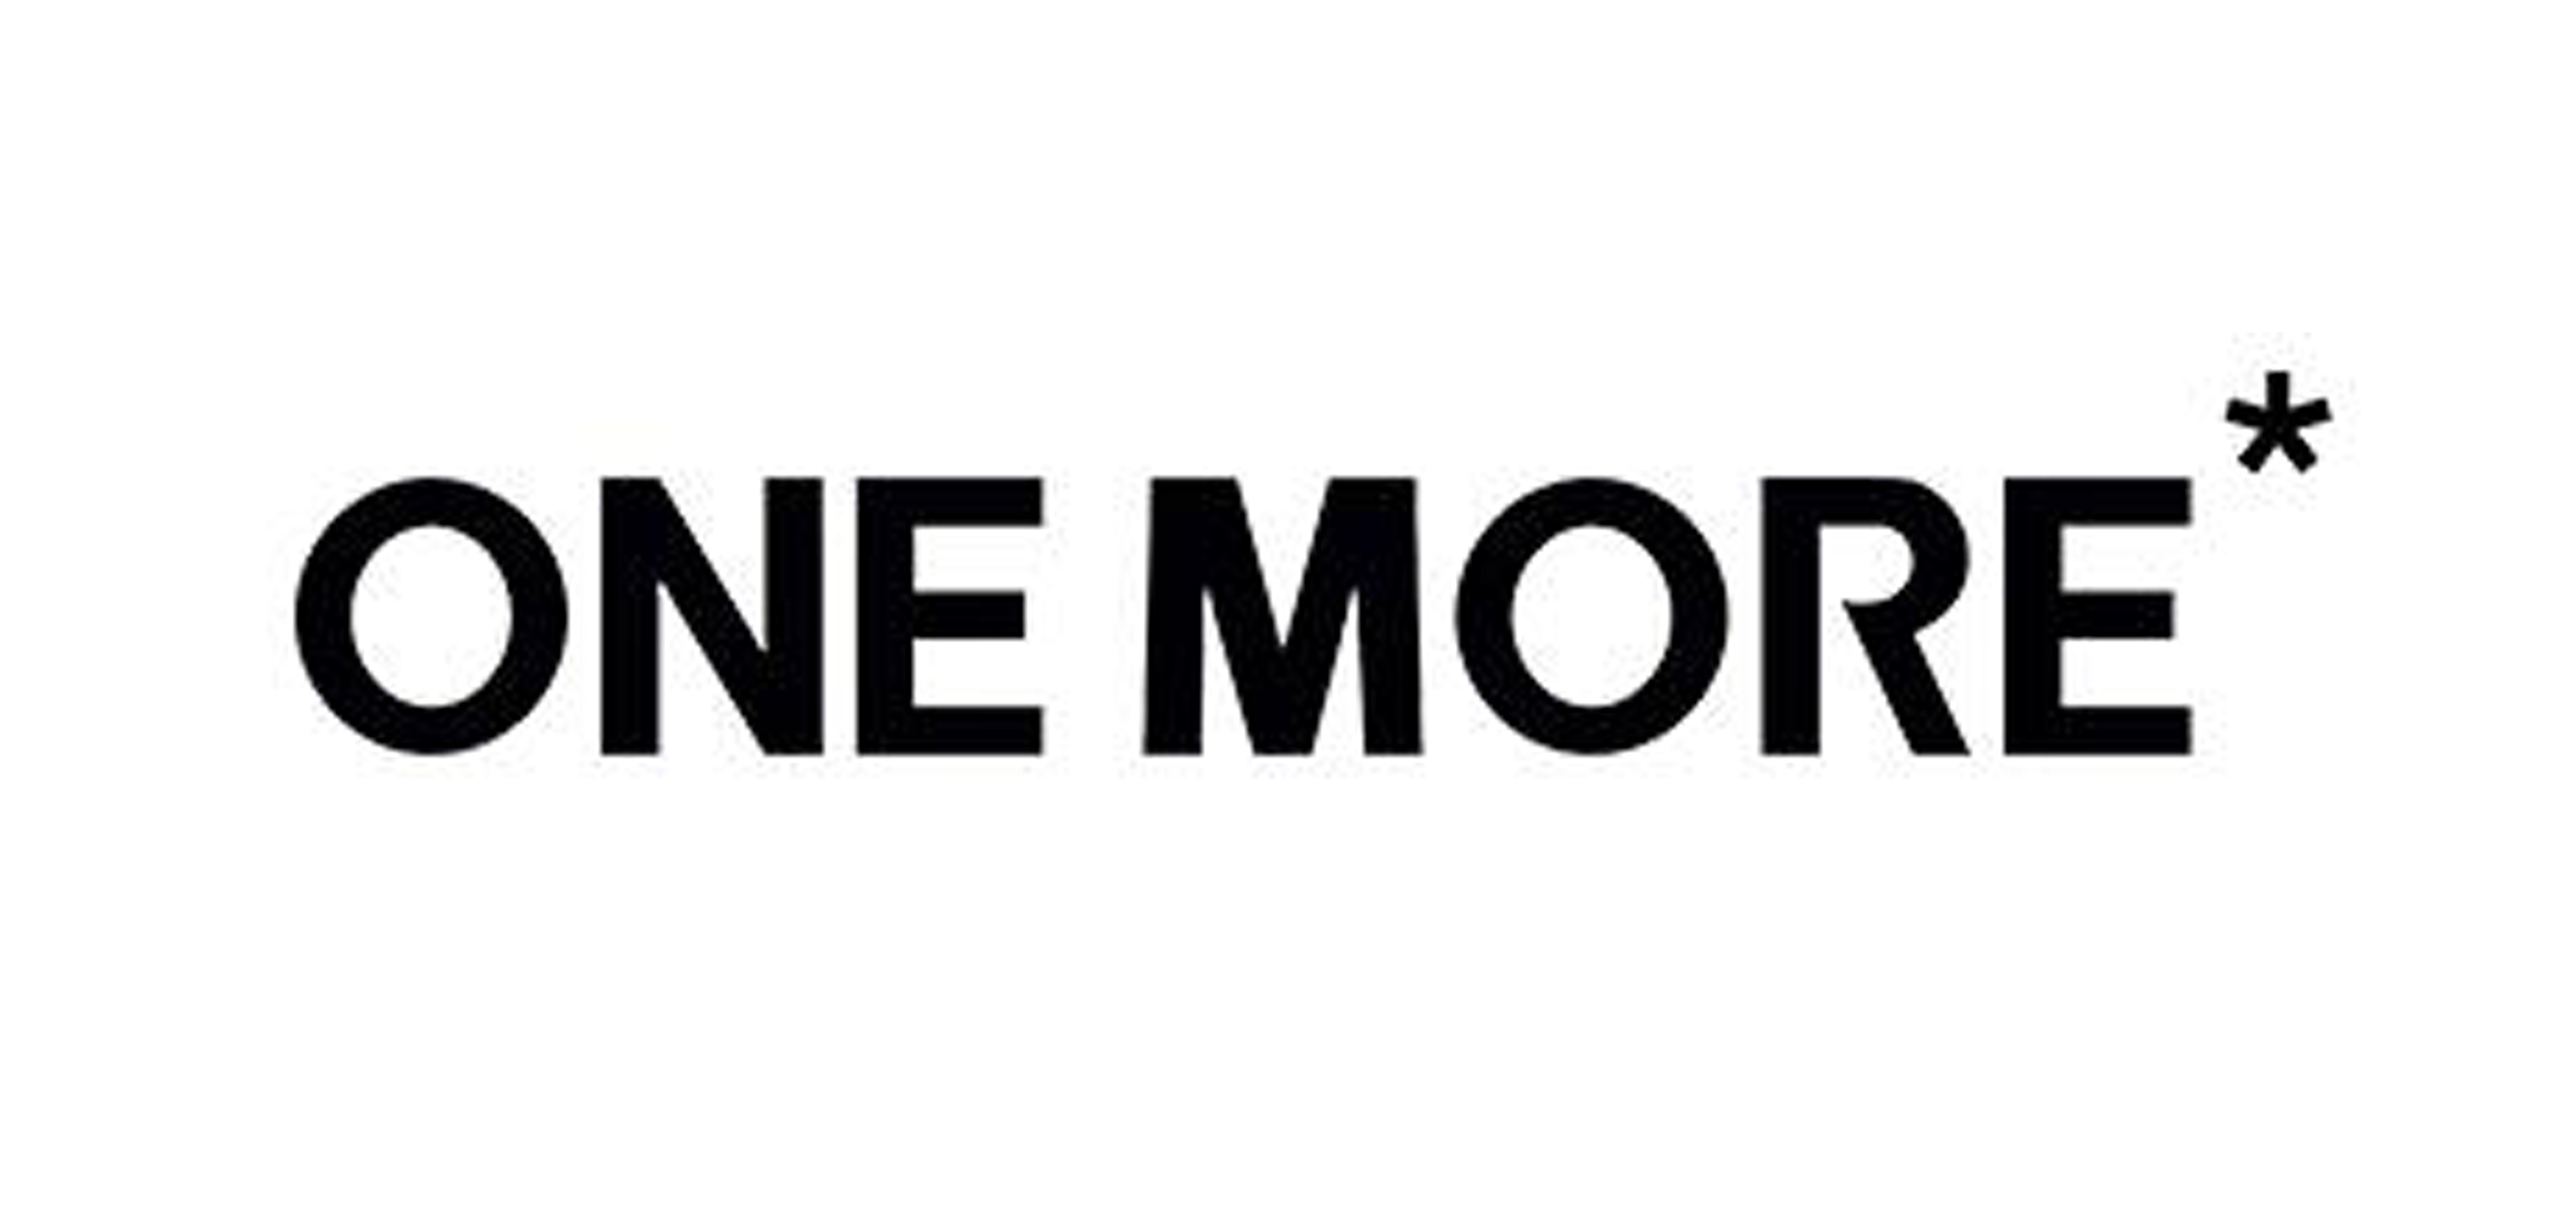 ONEMORE是什么牌子_ONEMORE品牌怎么样?